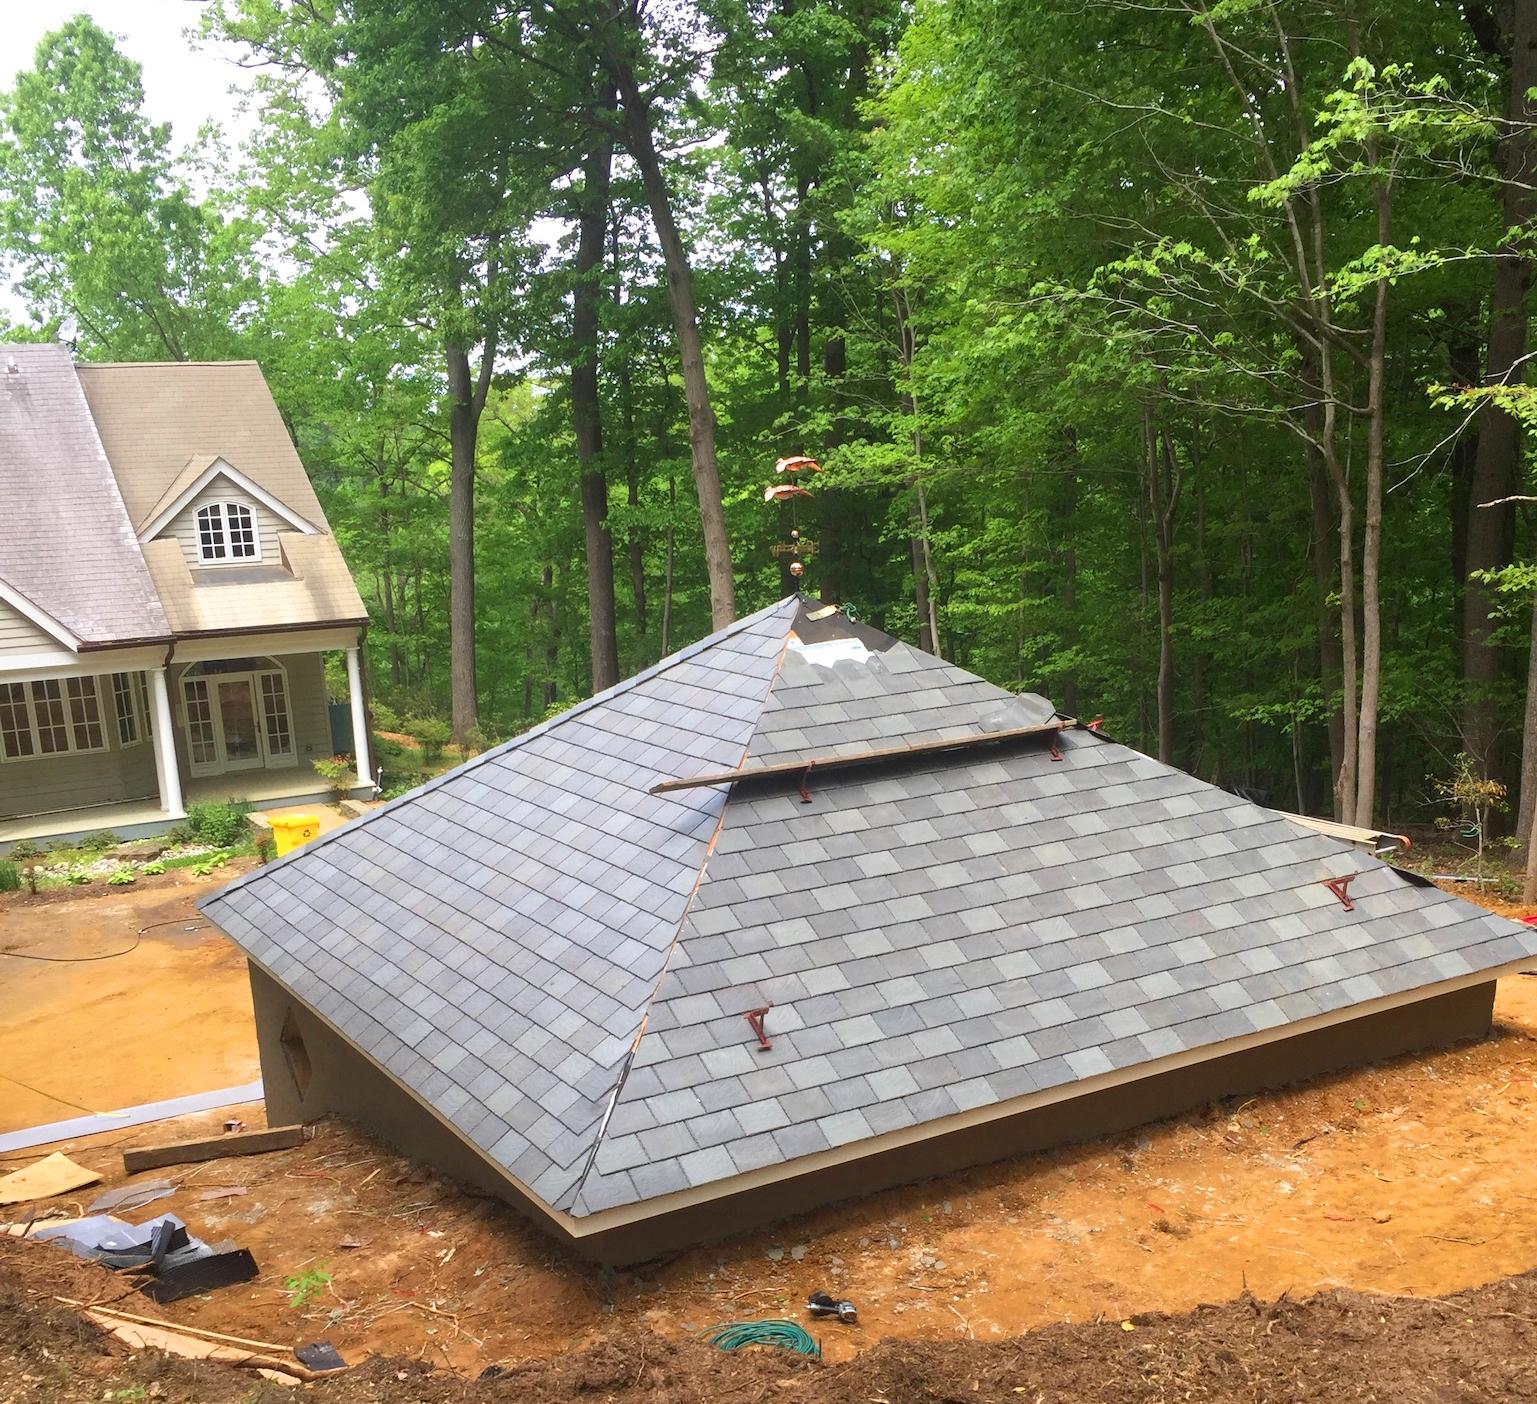 Severna Park Roofing Contractors